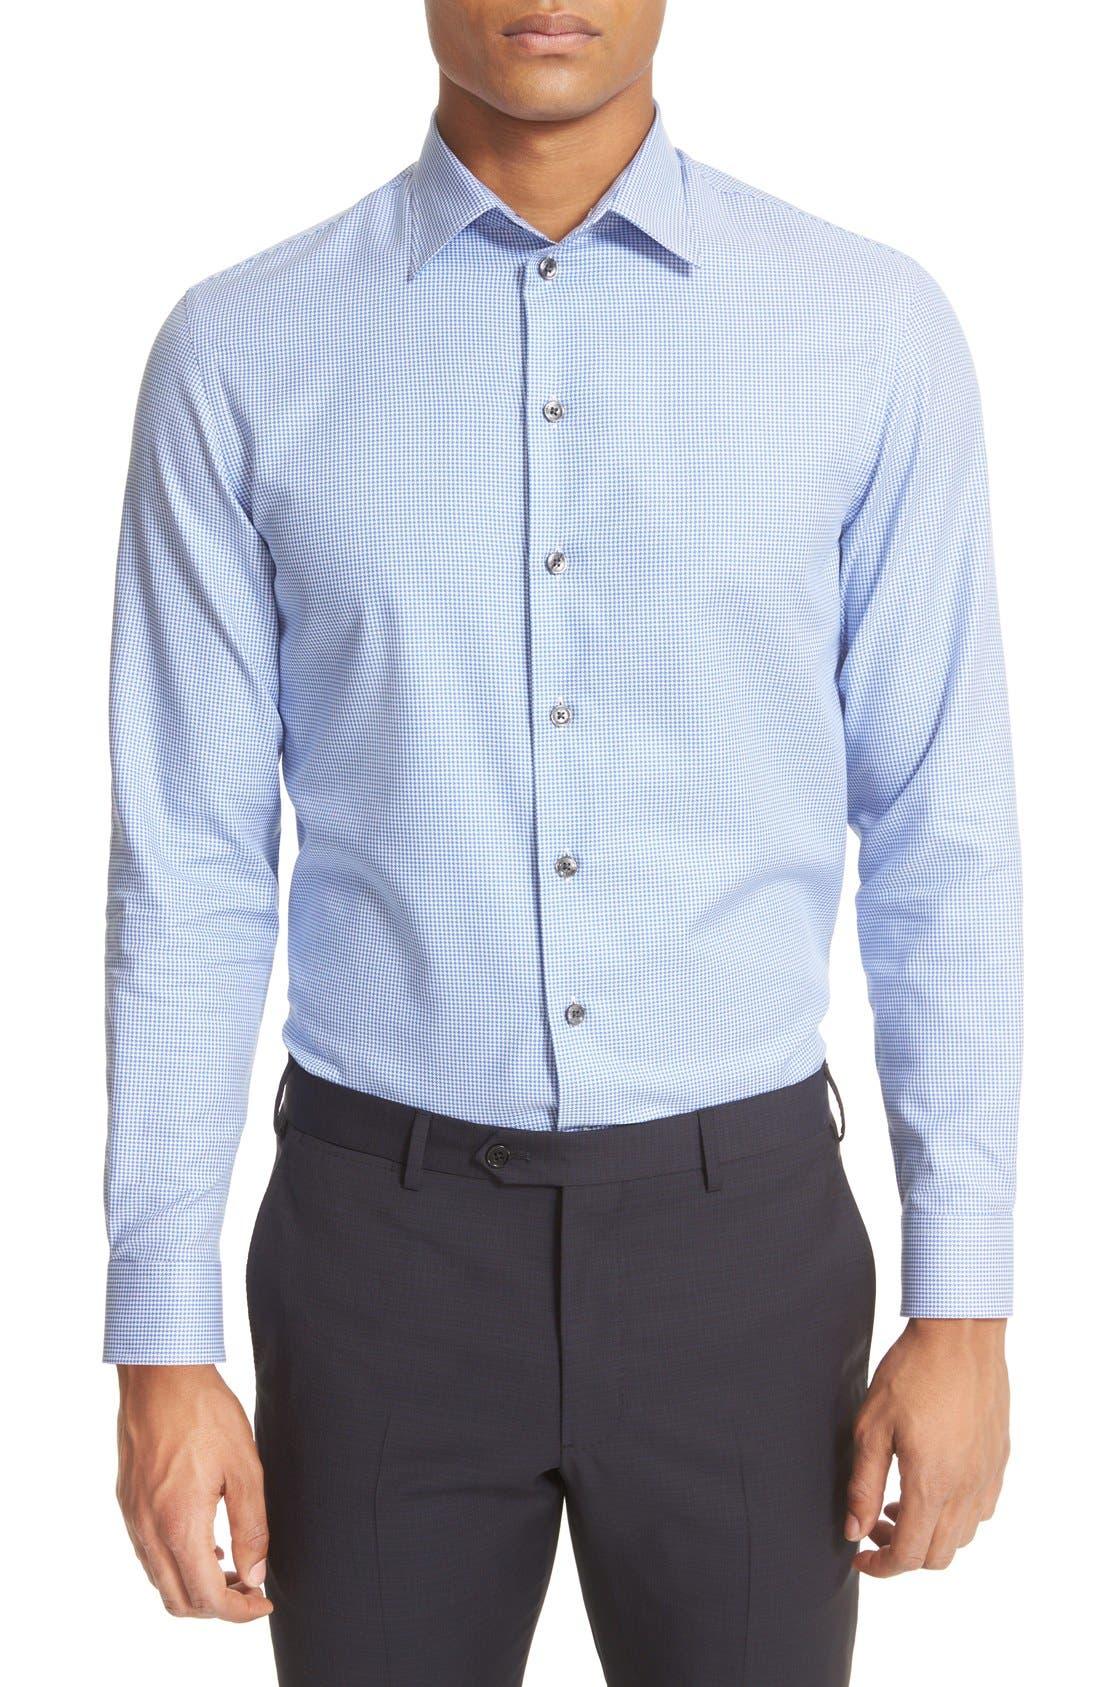 ARMANI COLLEZIONI Trim Fit Micro Houndstooth Dress Shirt